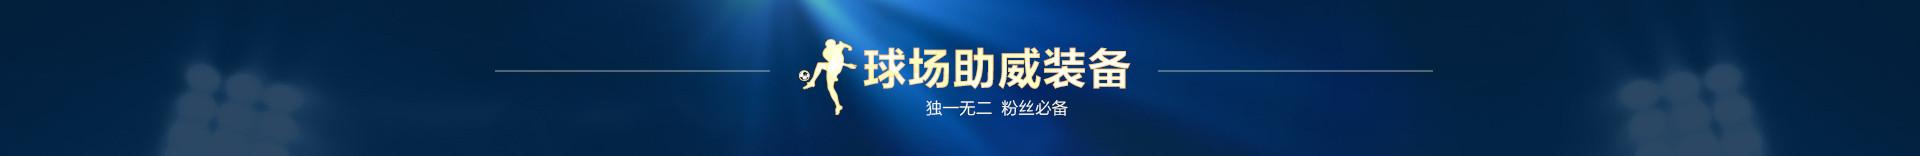 http://image.suning.cn/uimg/sop/commodity/143559946820965694212575_x.jpg